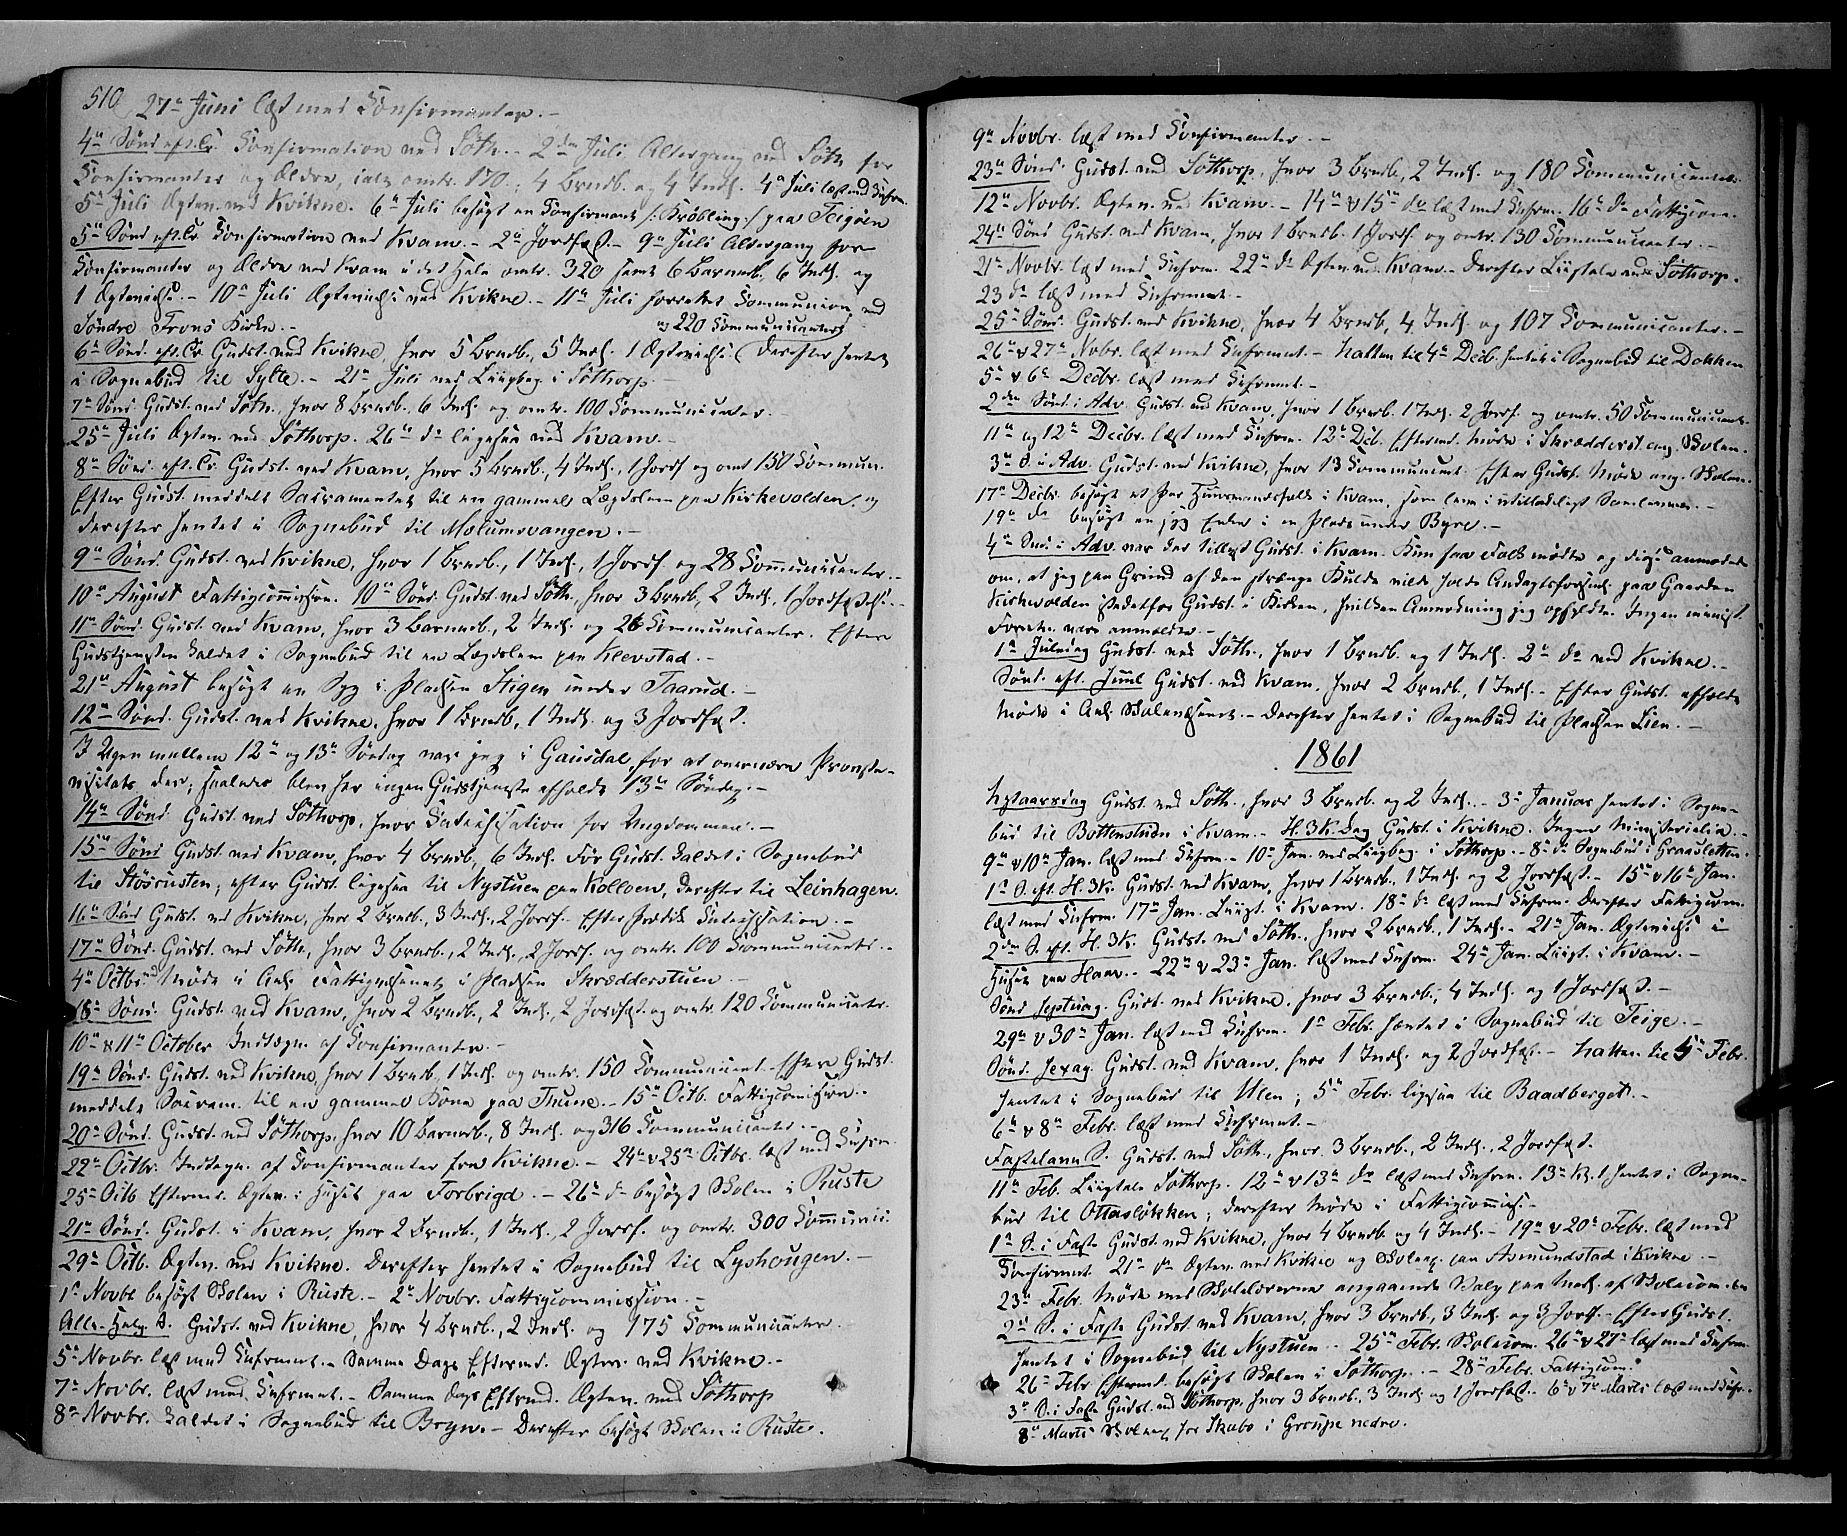 SAH, Nord-Fron prestekontor, Ministerialbok nr. 1, 1851-1864, s. 510